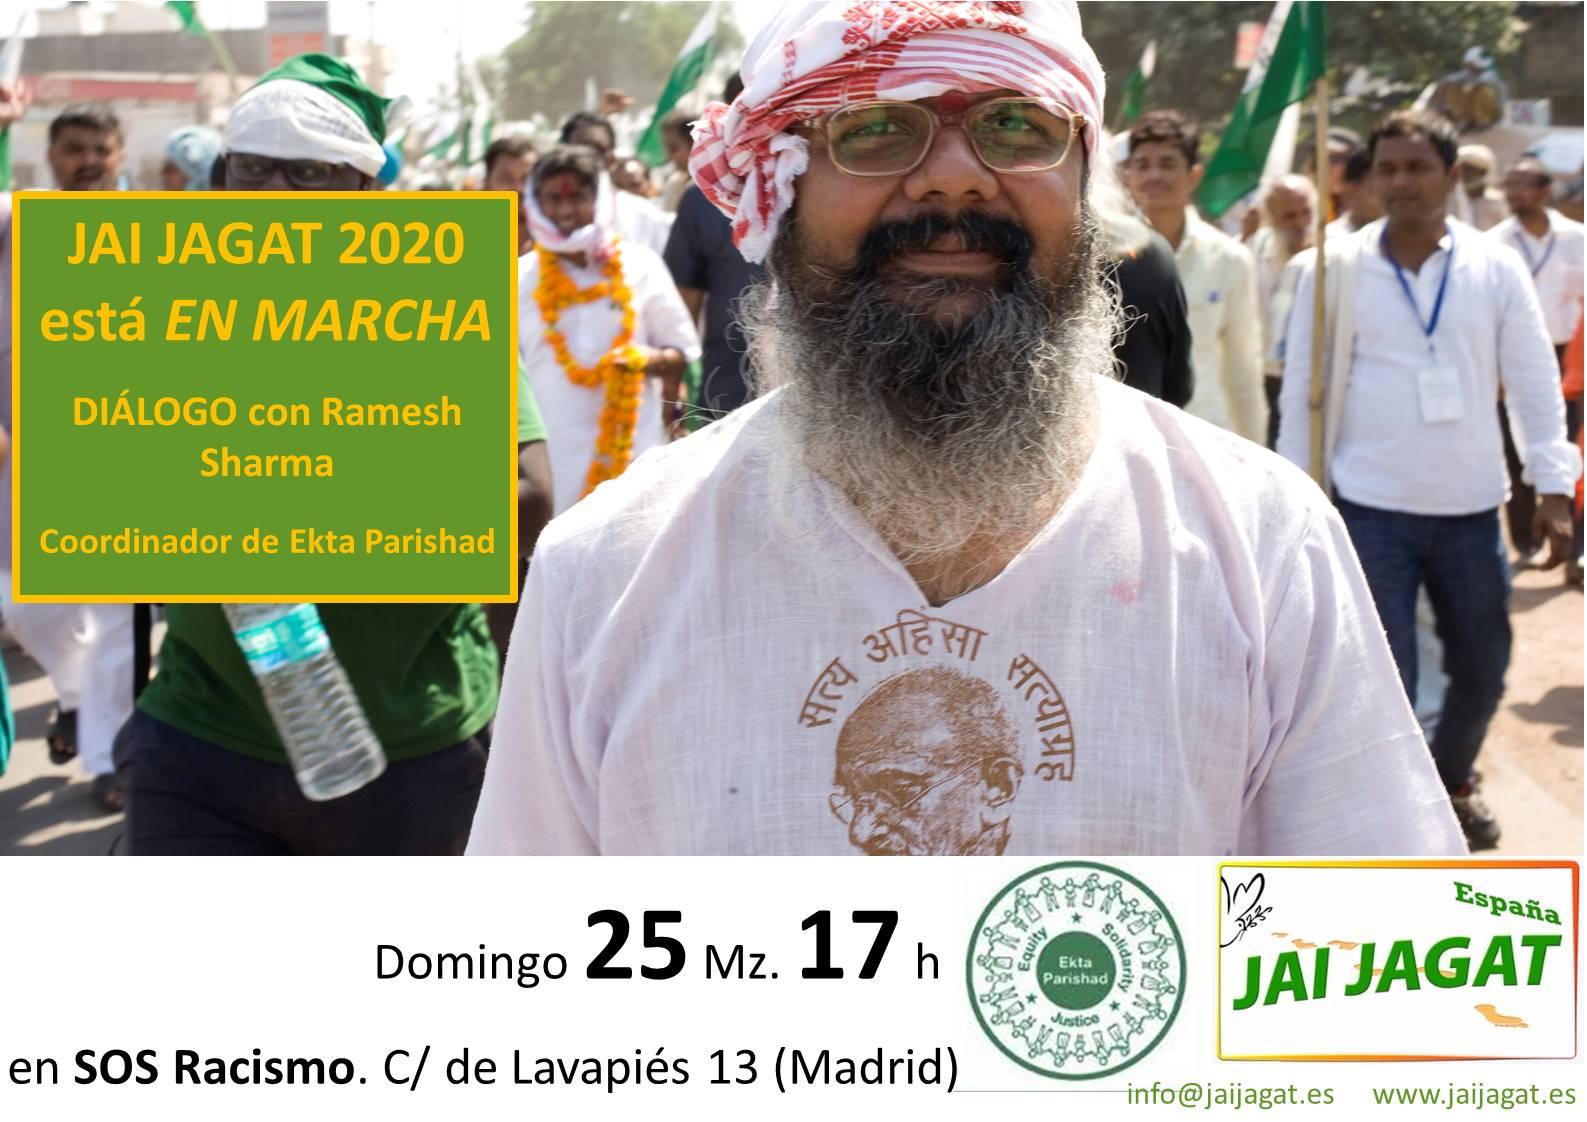 Madrid: Jai Jagat 2020 está en marcha